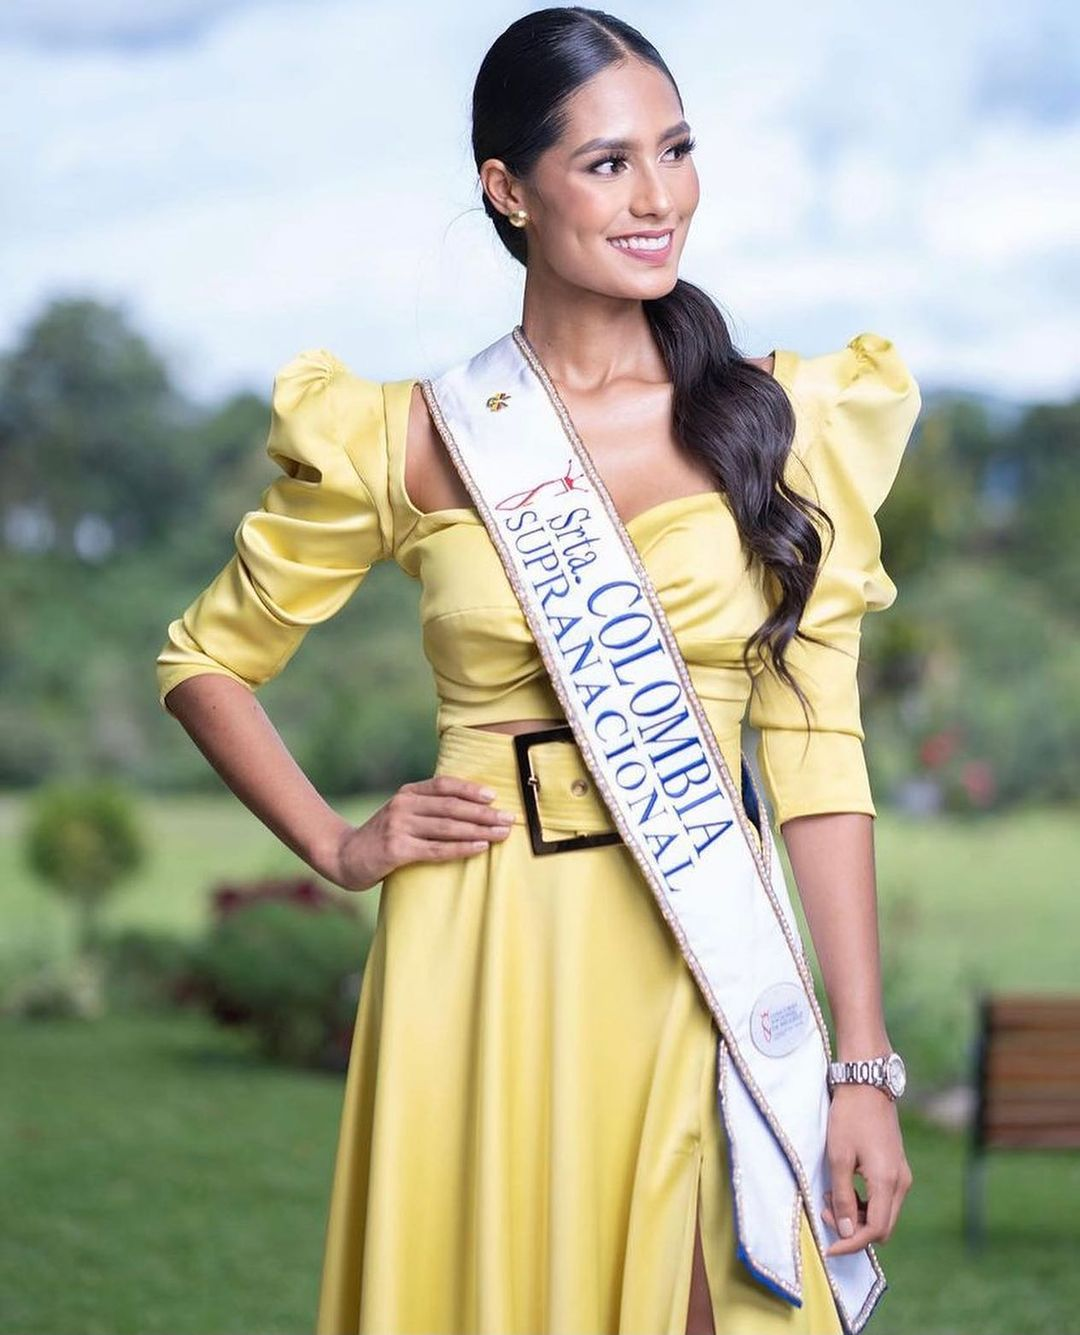 valentina aldana, miss supranational colombia 2021. 22765614